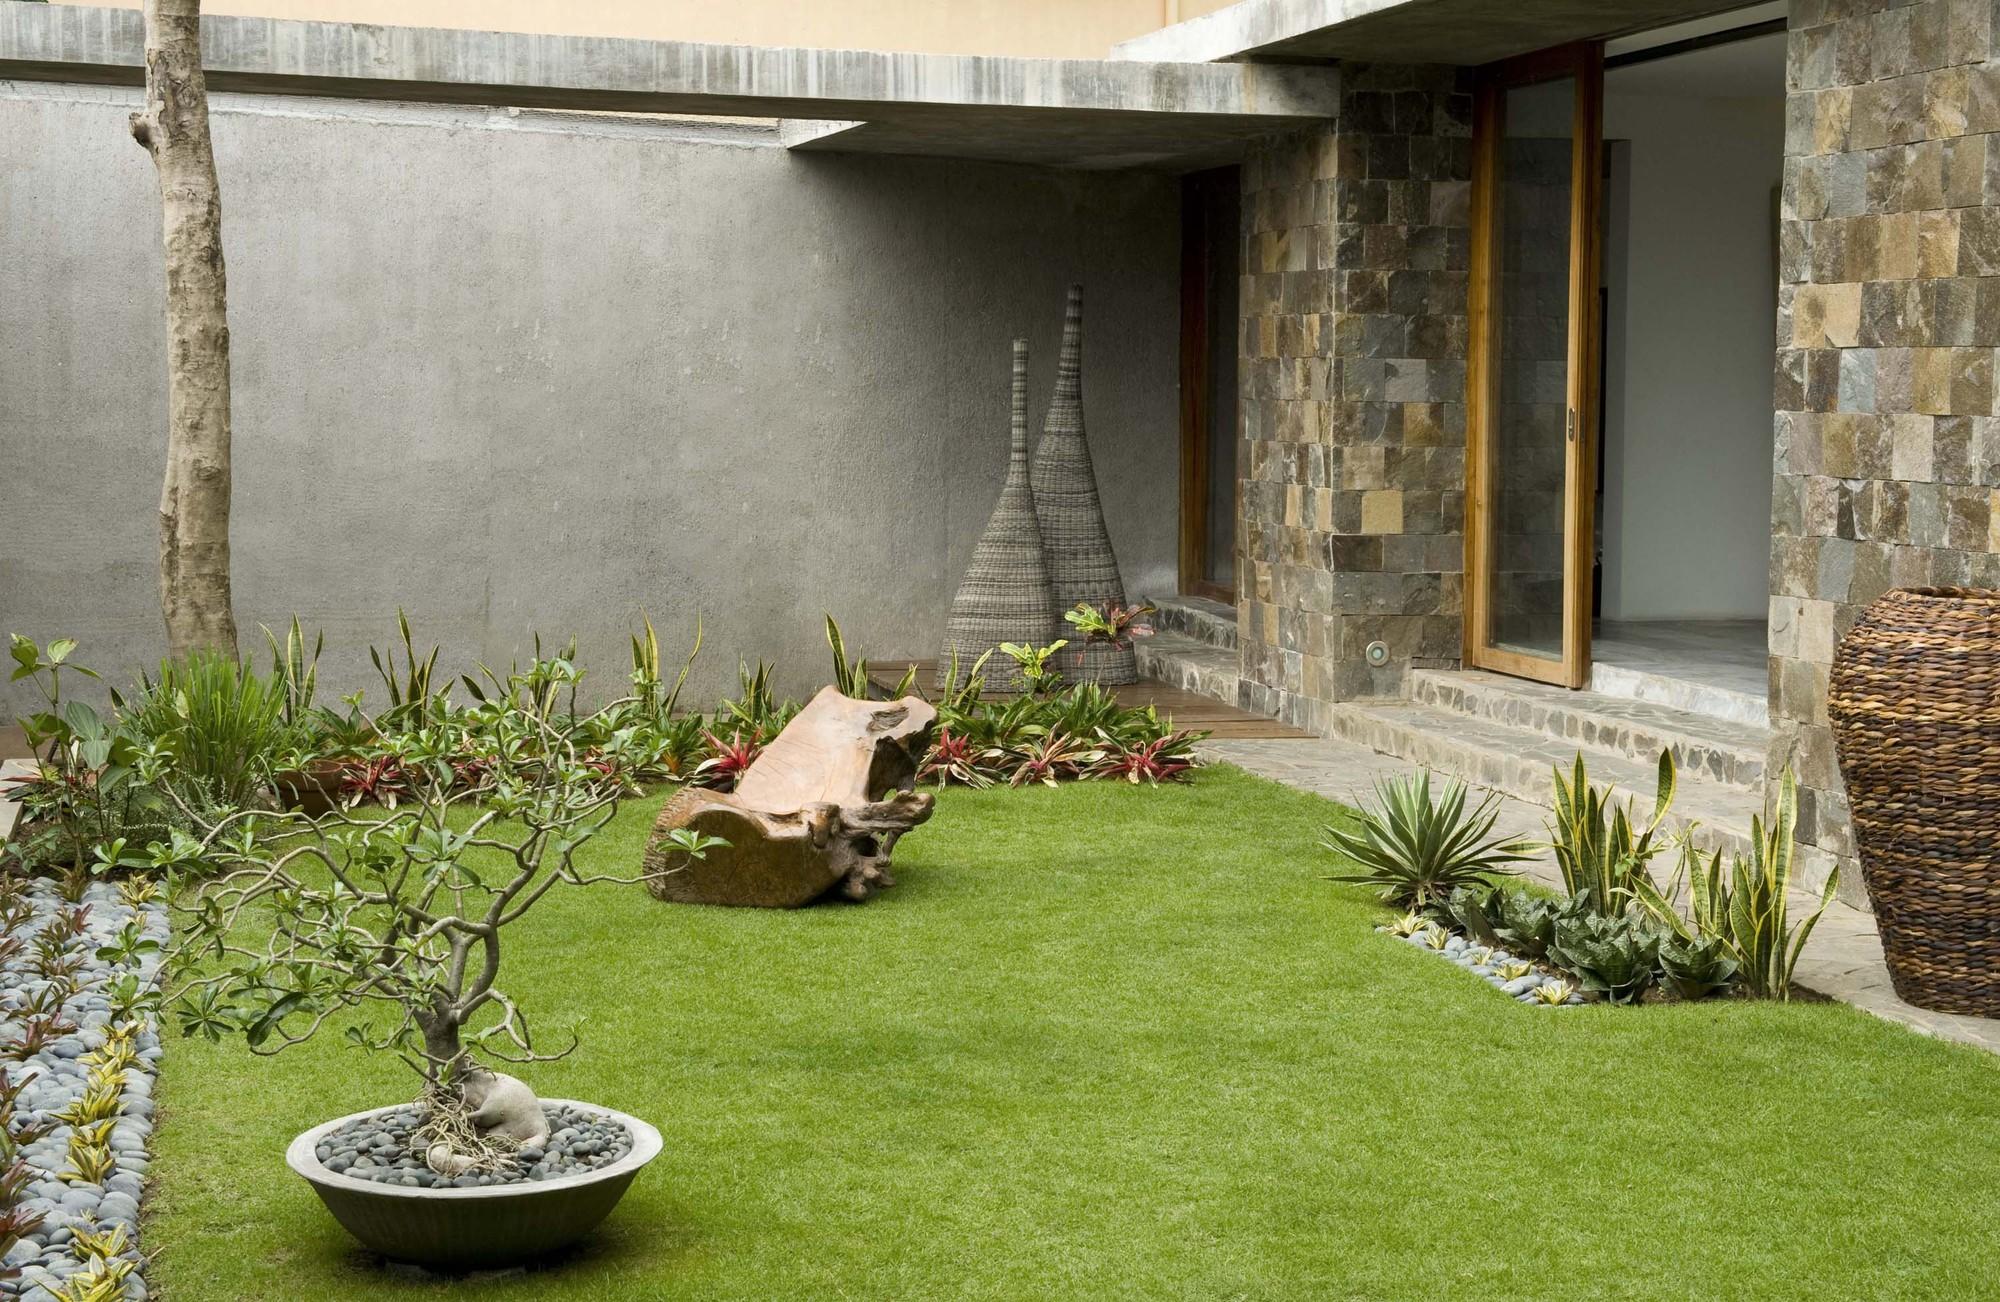 Dise o de casa r stica fachada interiores y planos for Diseno de jardines interiores modernos